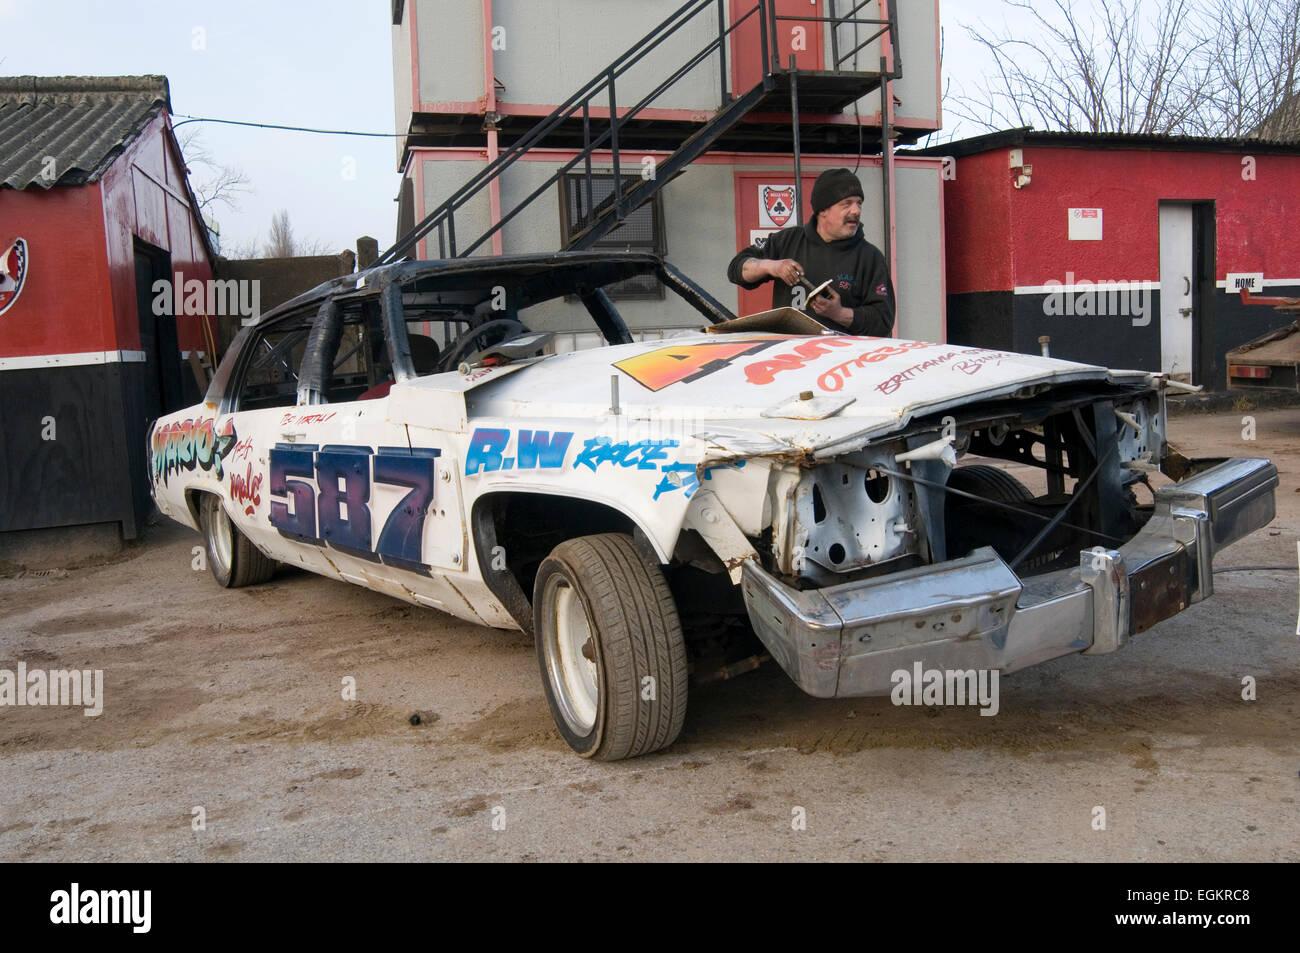 old smashed up Cadillac at a demo derby destruction derbies banger race racing races junk scrap american large big - Stock Image